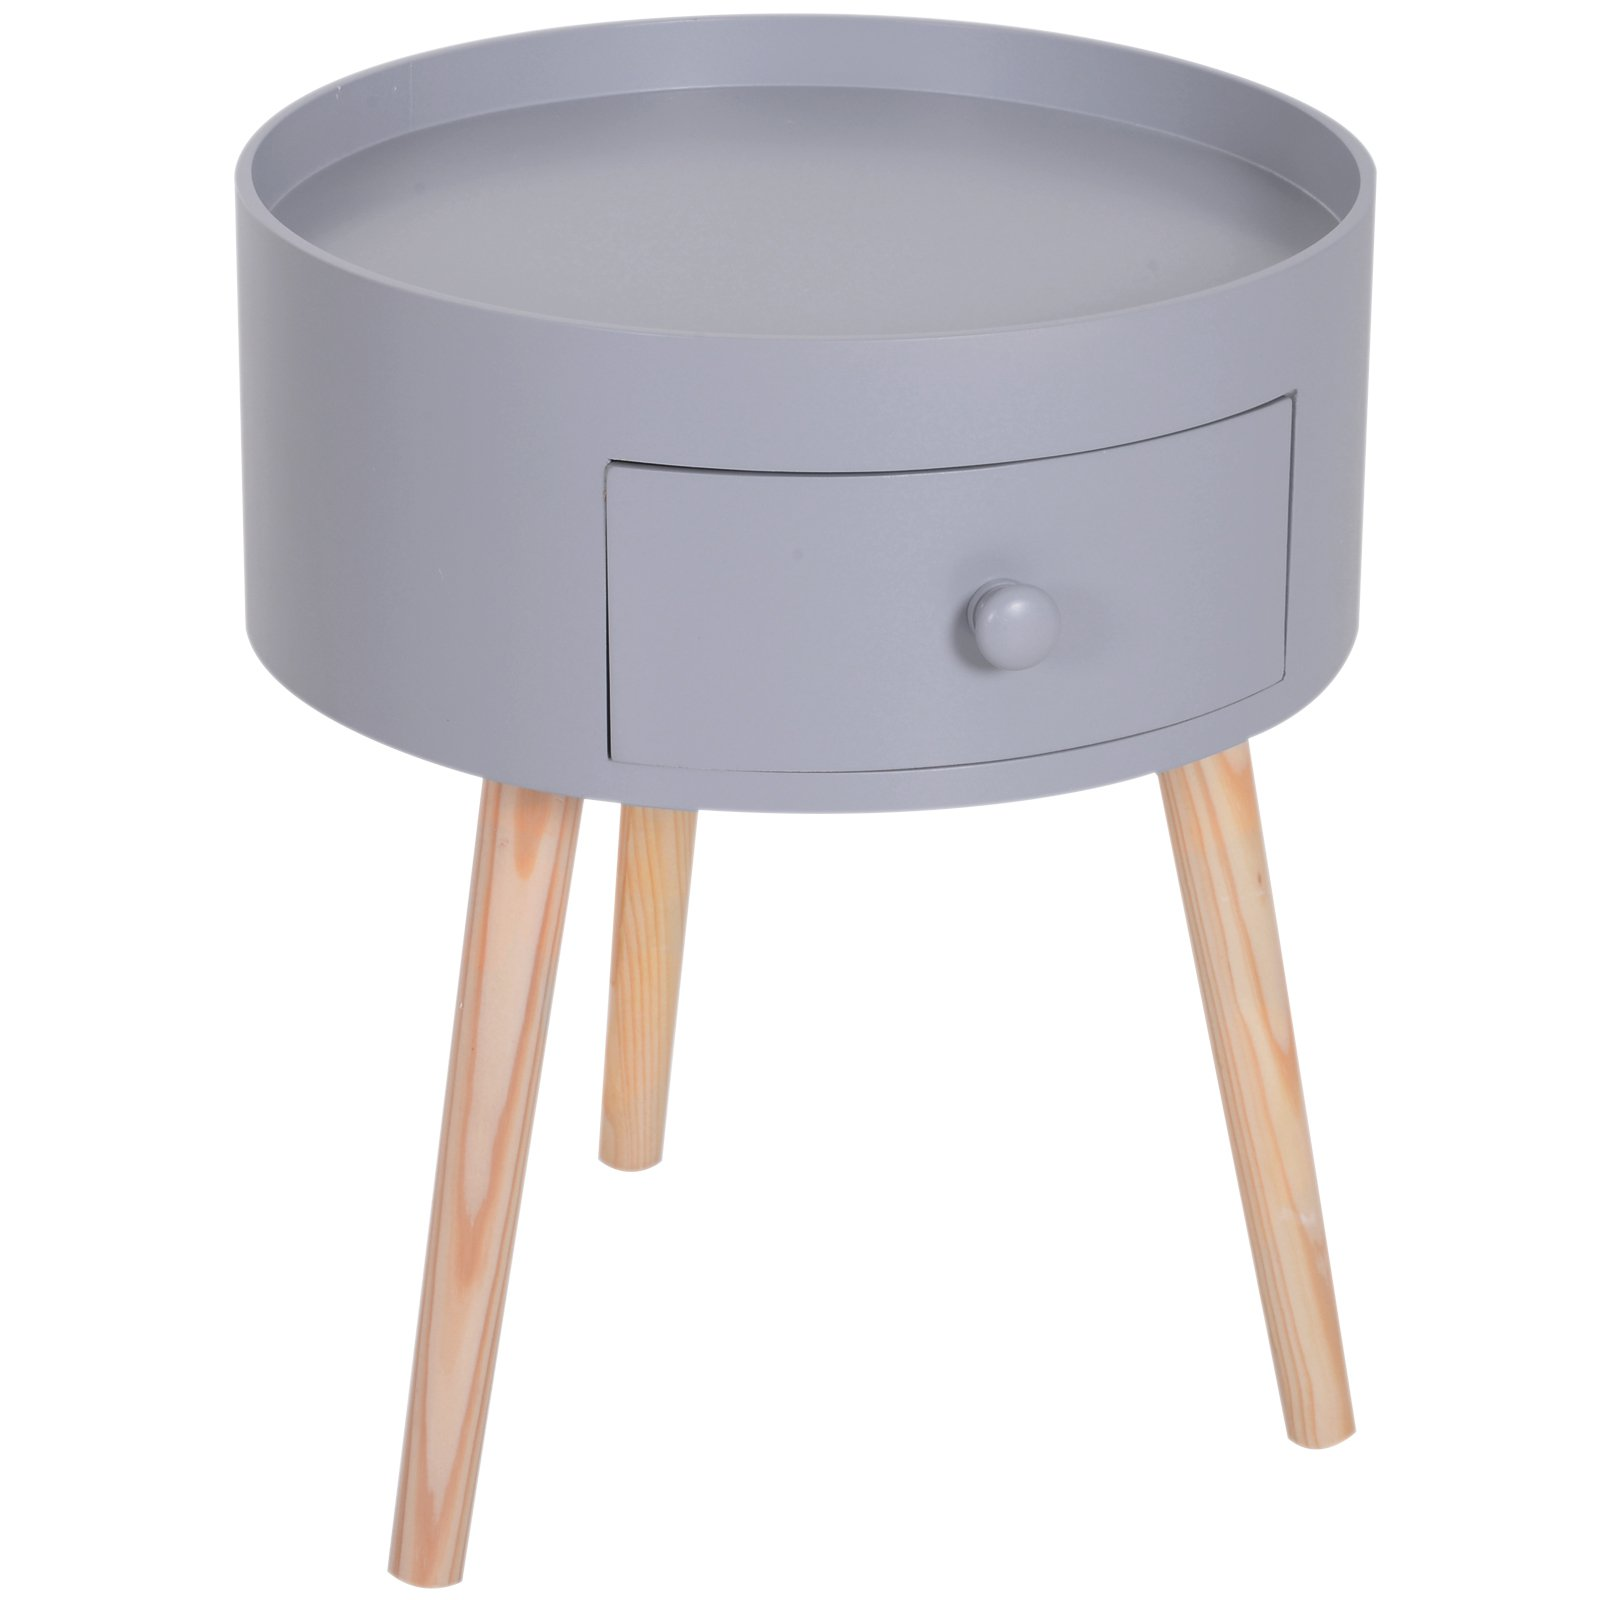 Homcom Table de Chevet Ronde Style Scandinave Gris 38 x 38 x 45 cm